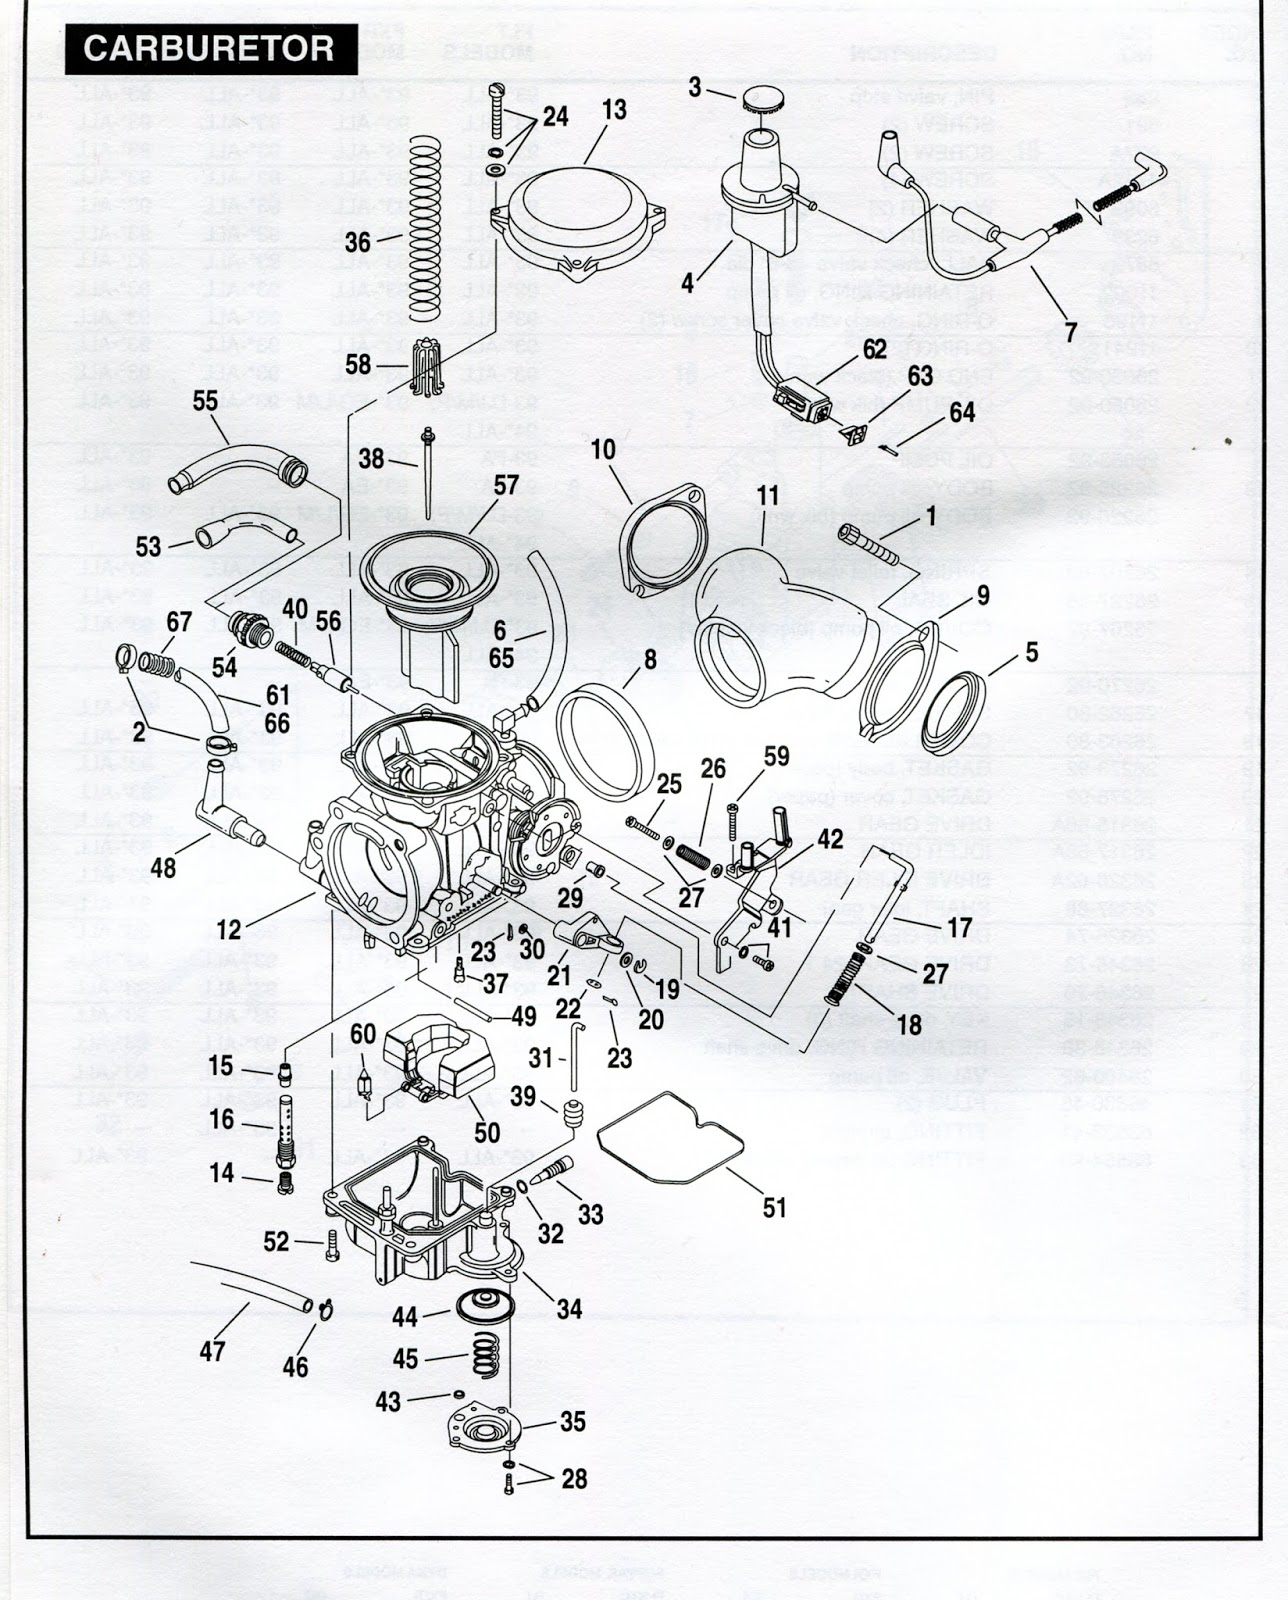 Harley Golf Cart Carburetor Diagram On Harley Davidson Golf Cart